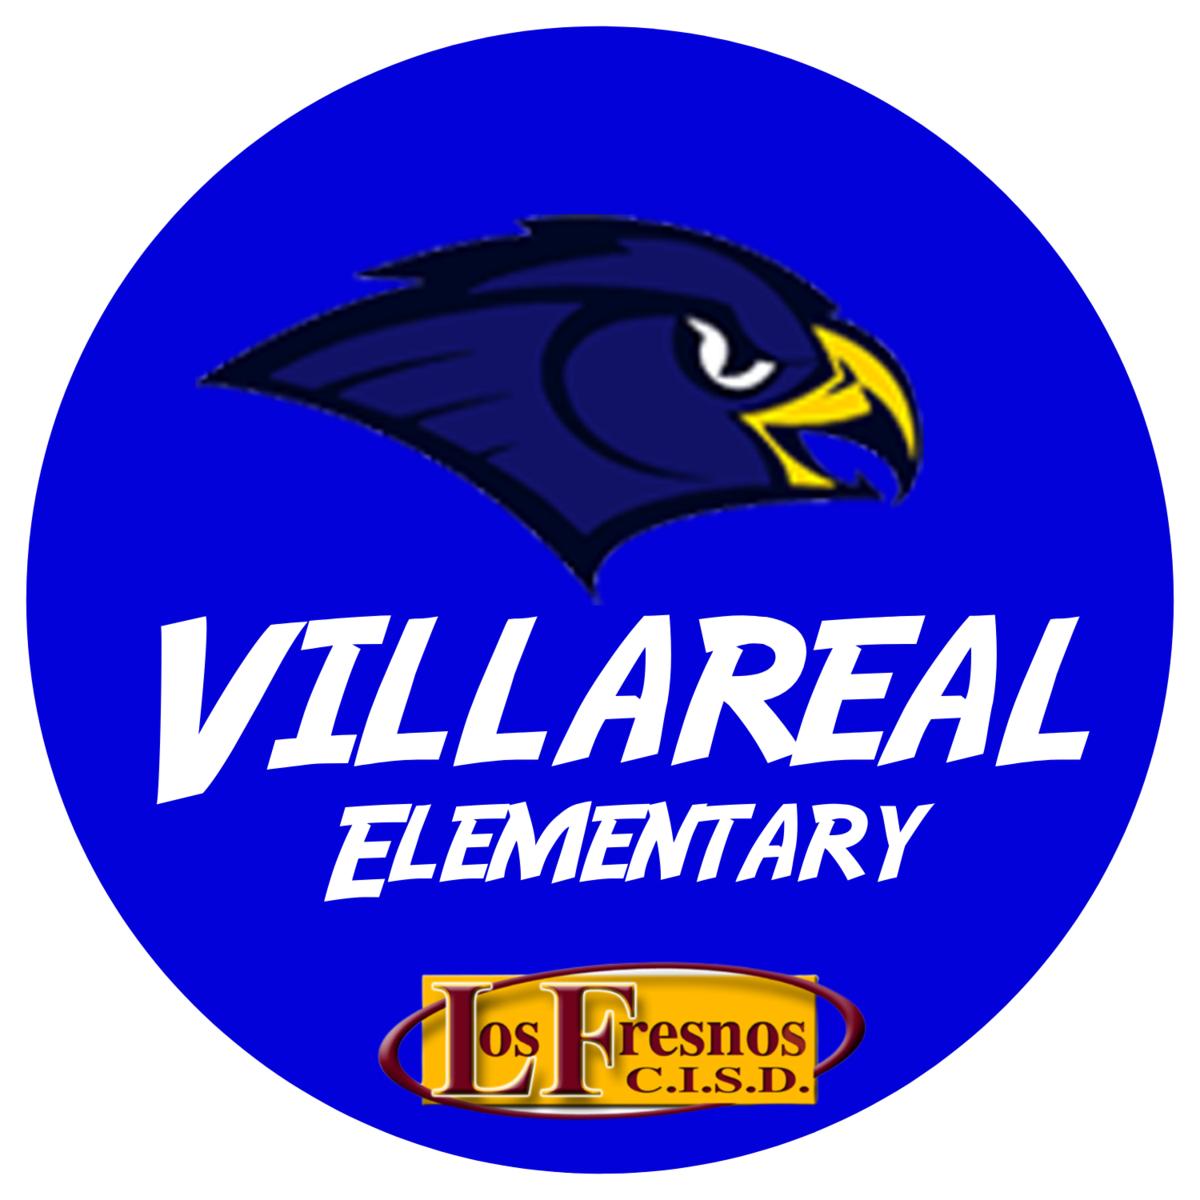 Villareal Elementary School logo